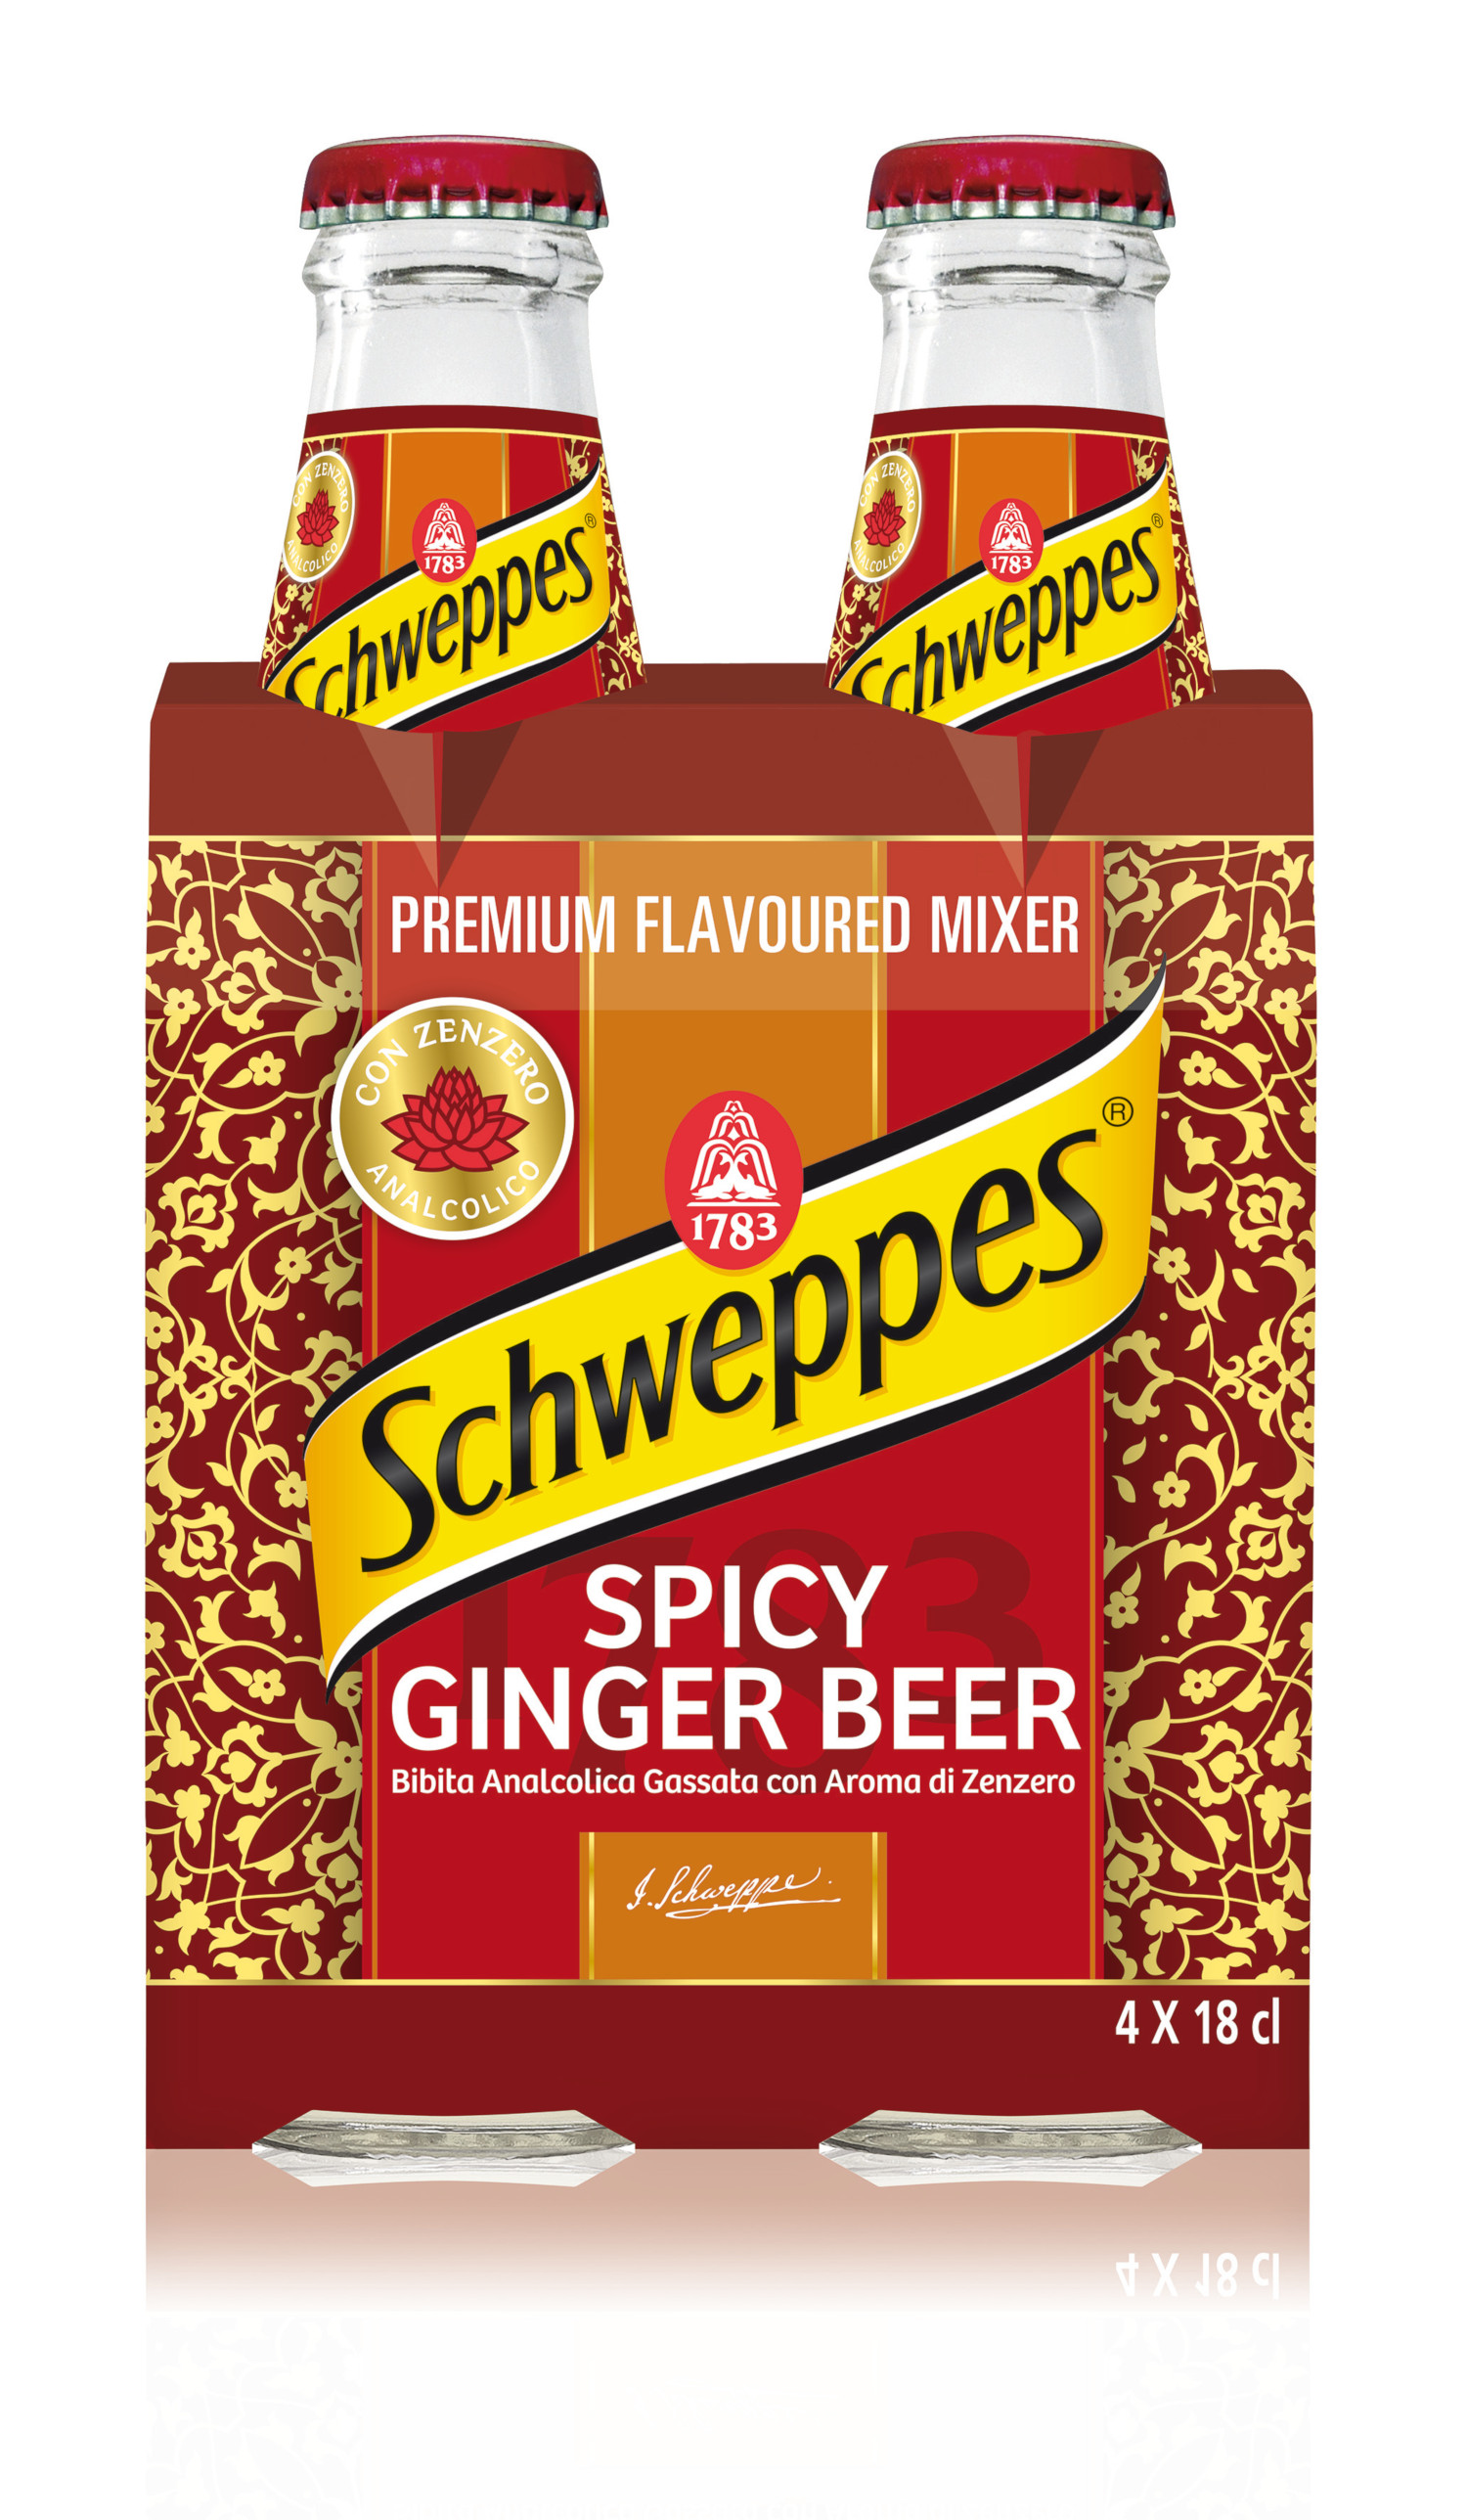 Risultati immagini per Spicy Ginger Beer Schweppes